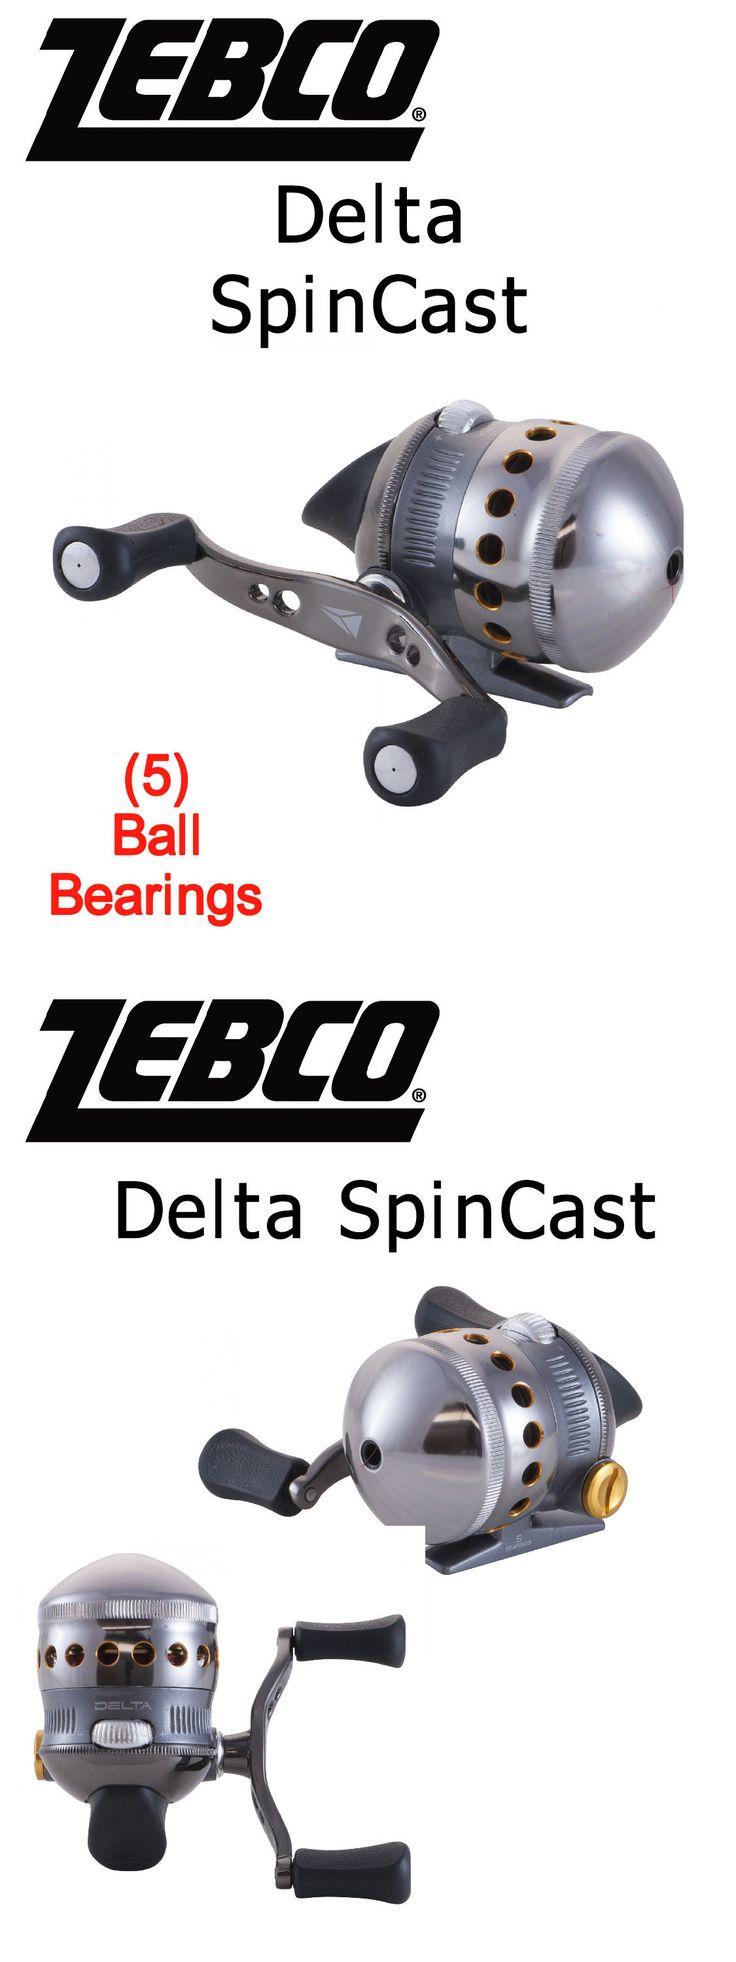 Spincasting Reels 108154: Zebco * Delta * Spincast Reel * Zd3 * (Size 3) -> BUY IT NOW ONLY: $47.95 on eBay!